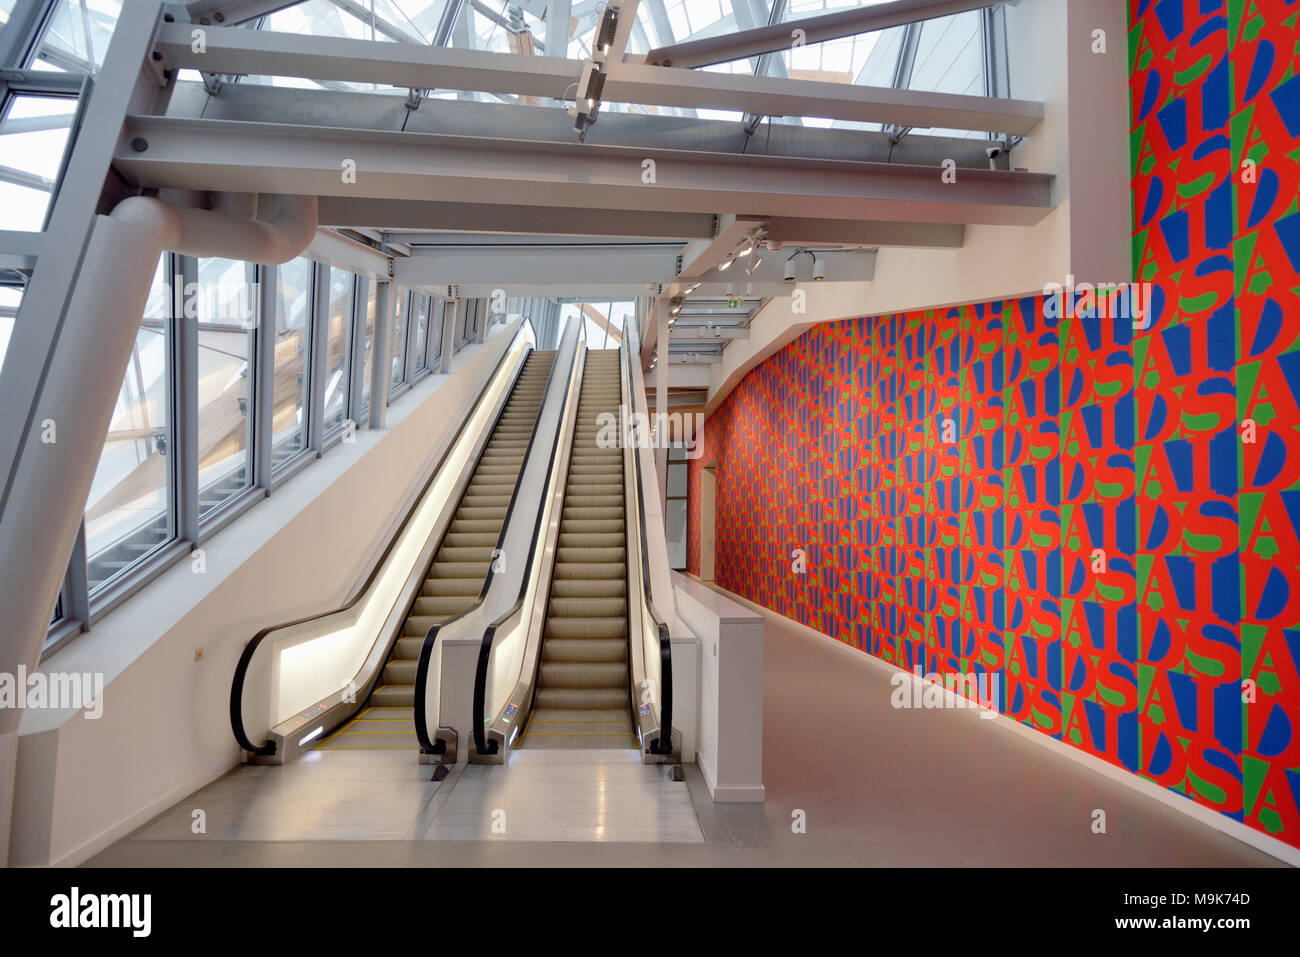 Fahrtreppen & Aids Tapete im Flur des Louis Vuitton Stiftung Kunst Museum & Cultural Center (2006-14.4.2006) von Frank Gehry entworfenen, Paris, Frankreich Stockbild